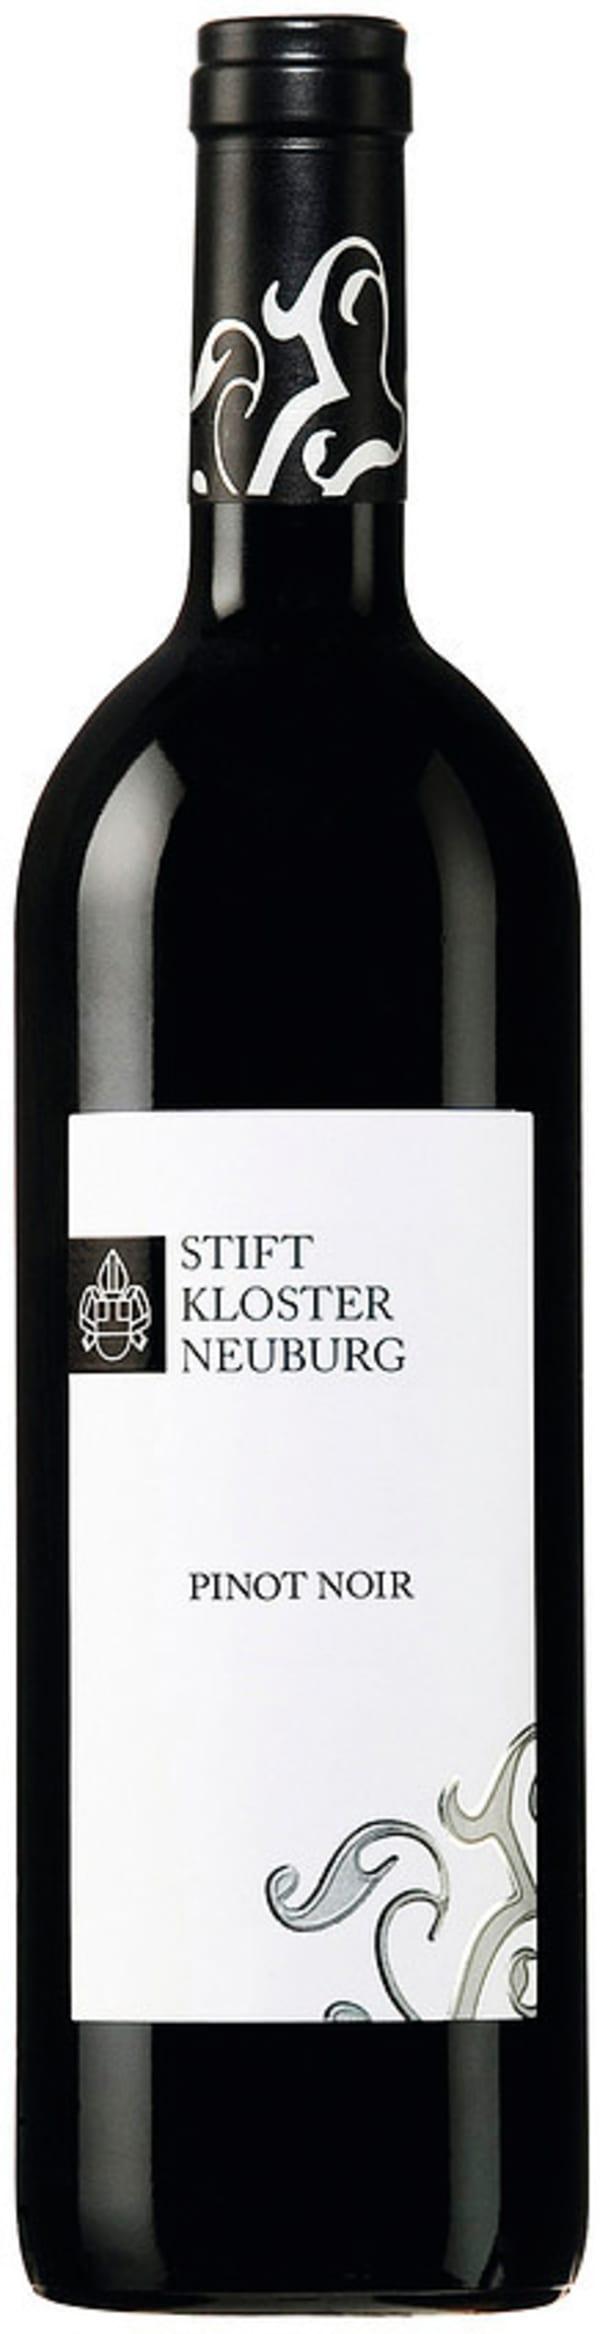 Stift Klosterneuburg Pinot Noir 2015